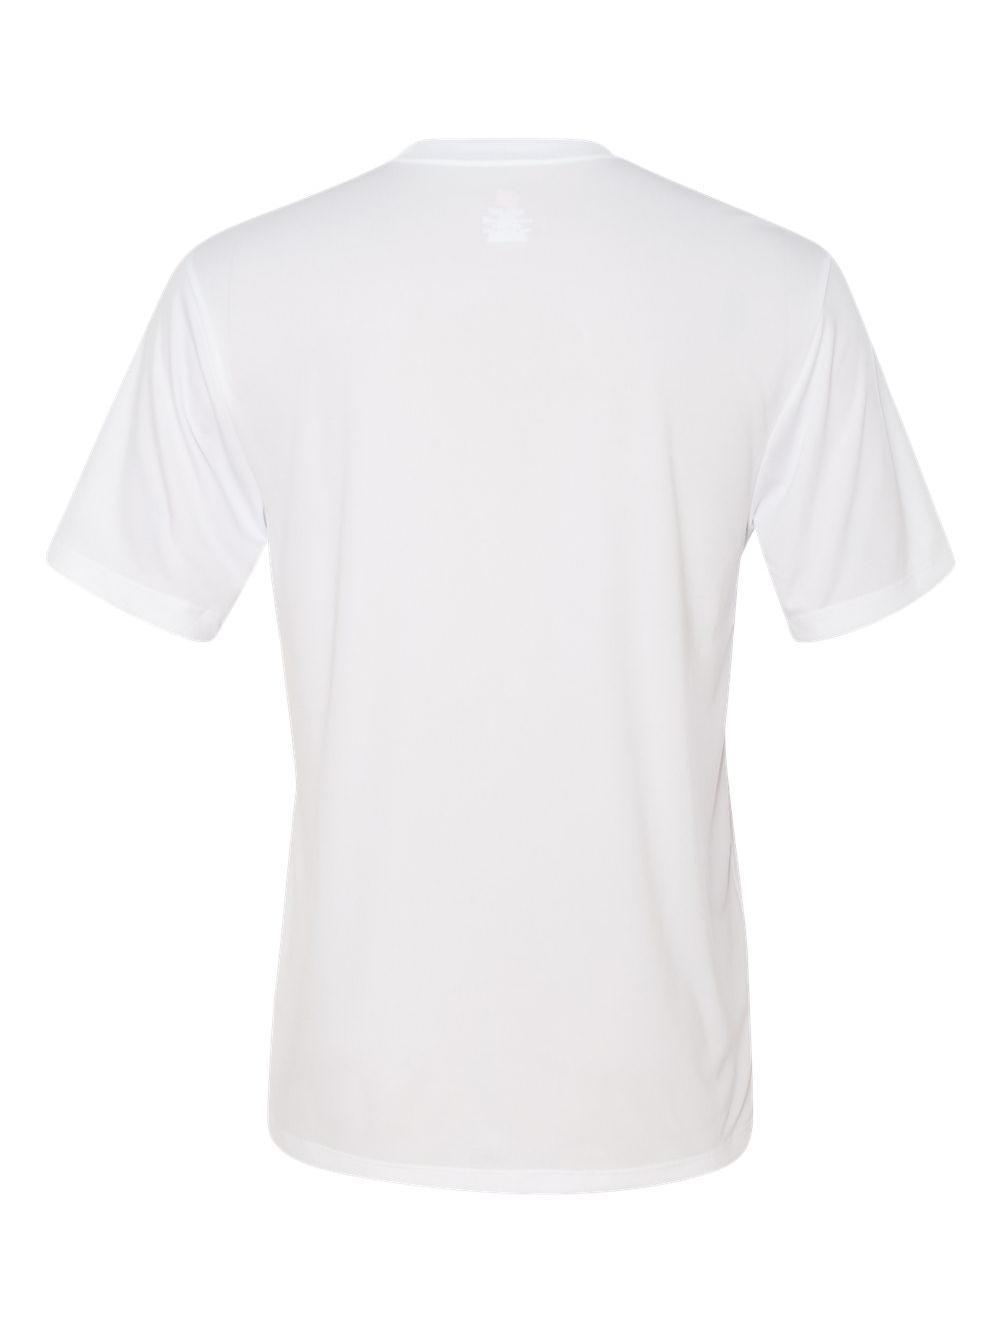 Hanes-Cool-Dri-Performance-Short-Sleeve-T-Shirt-4820 thumbnail 28